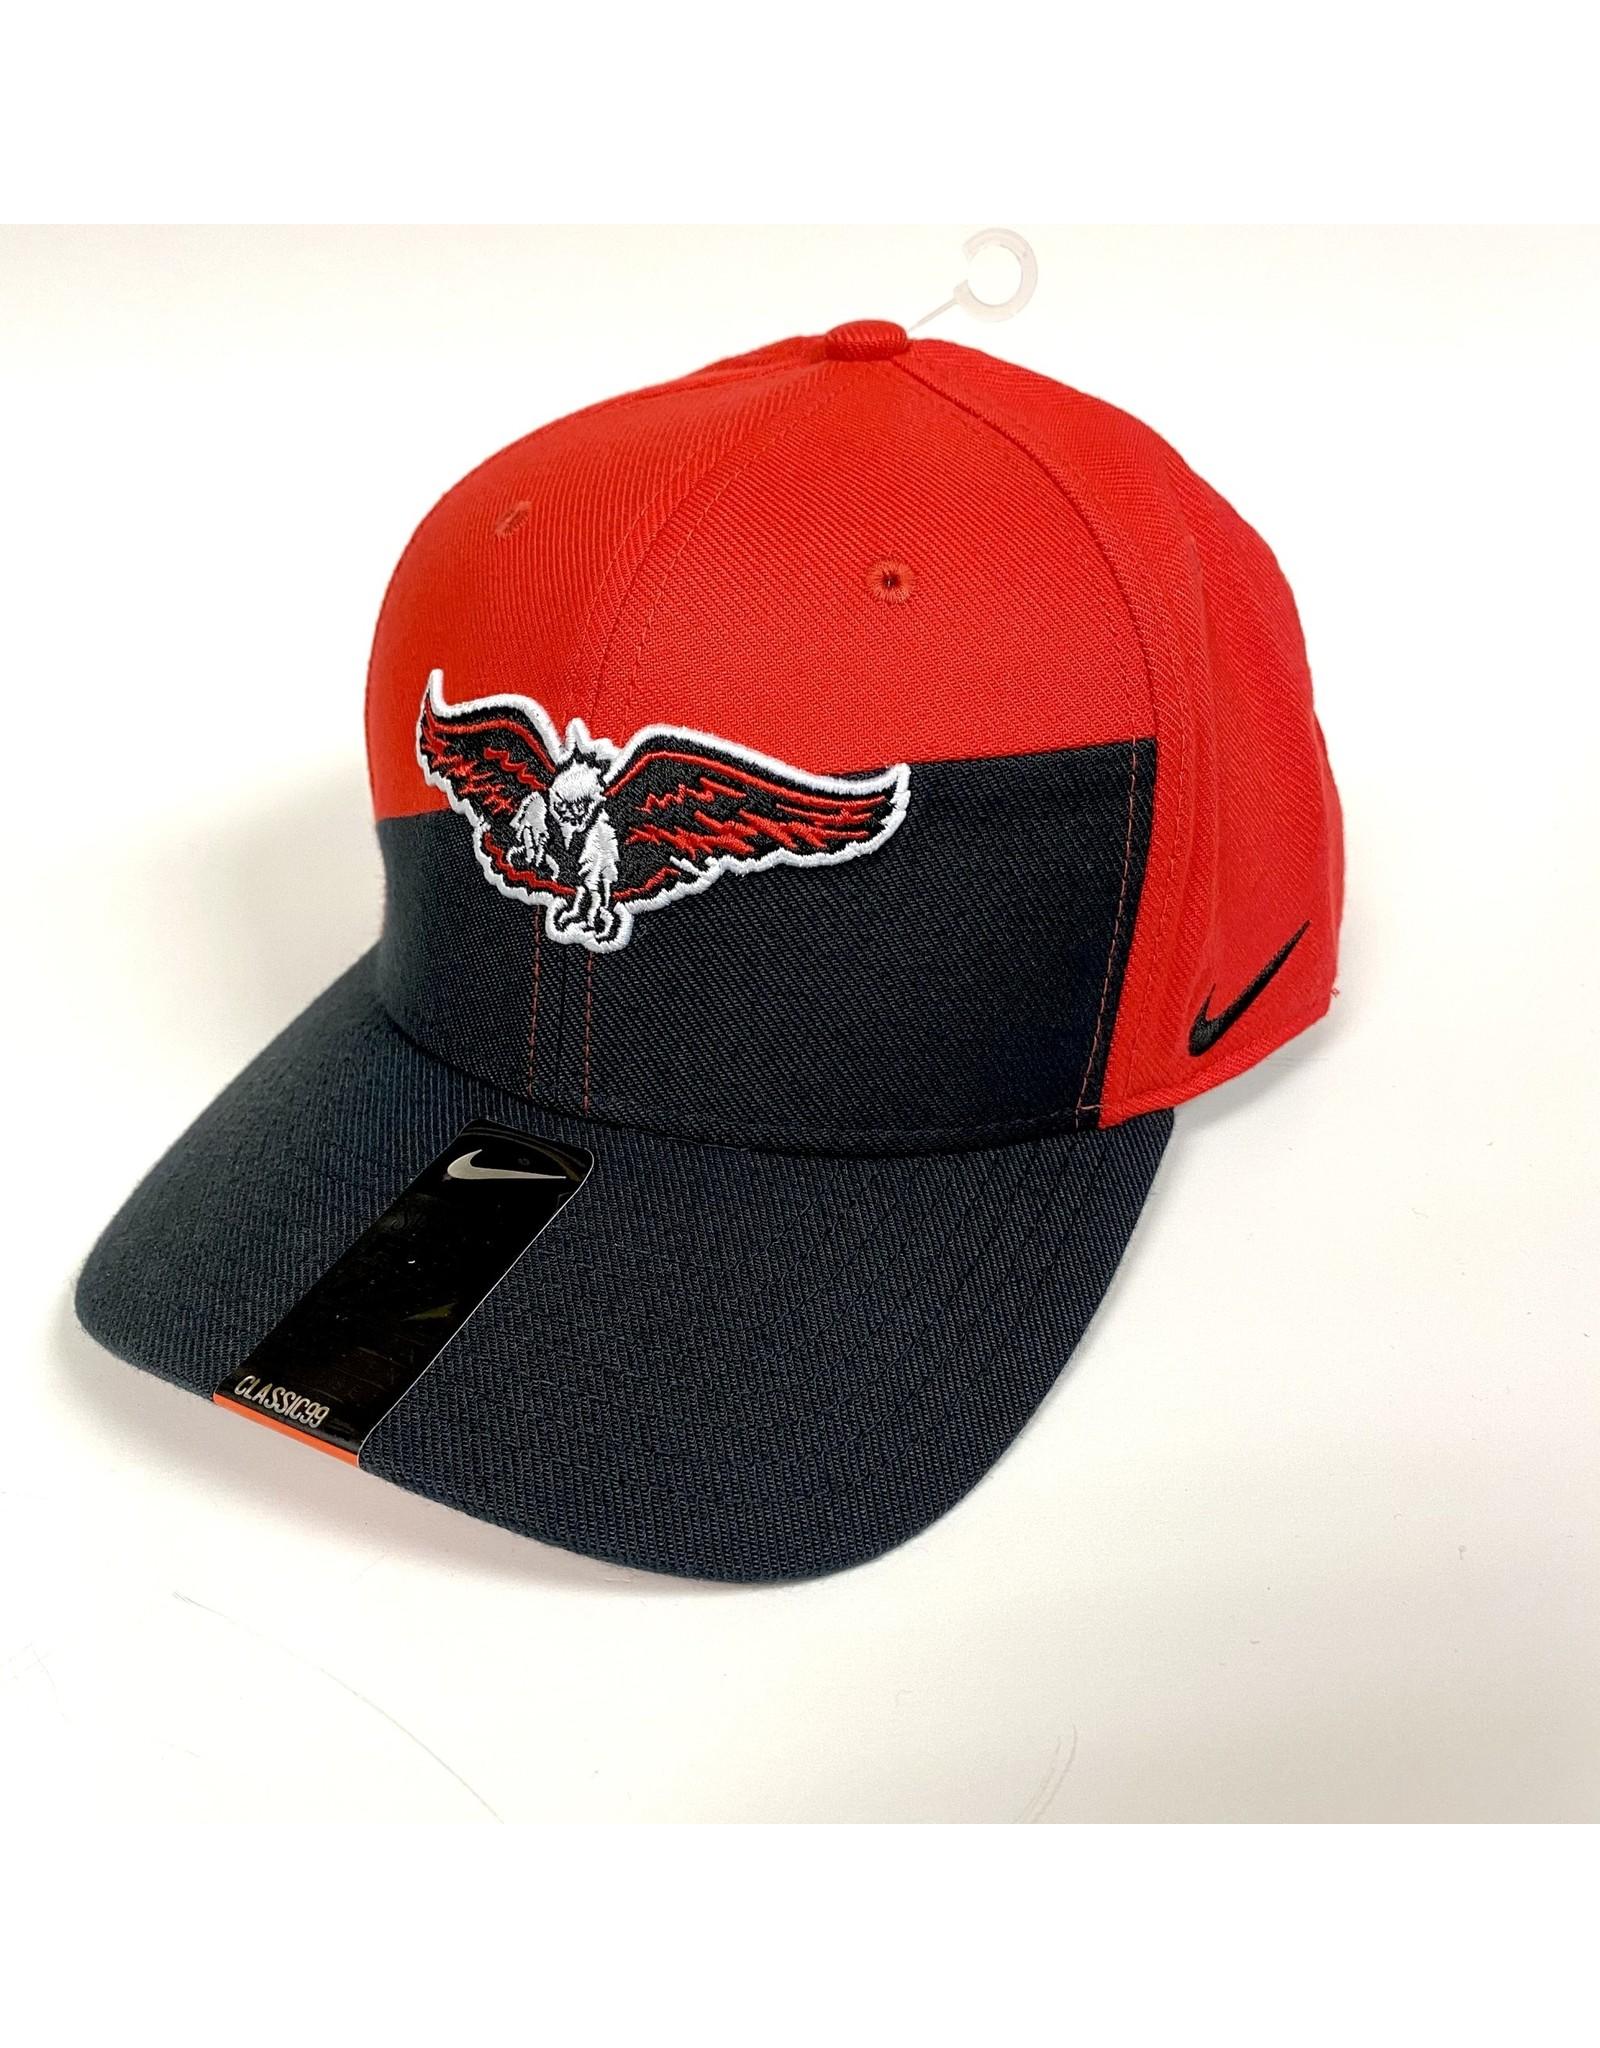 NIKE CAP Swoosh Flex Red/Black Eagle by NIKE